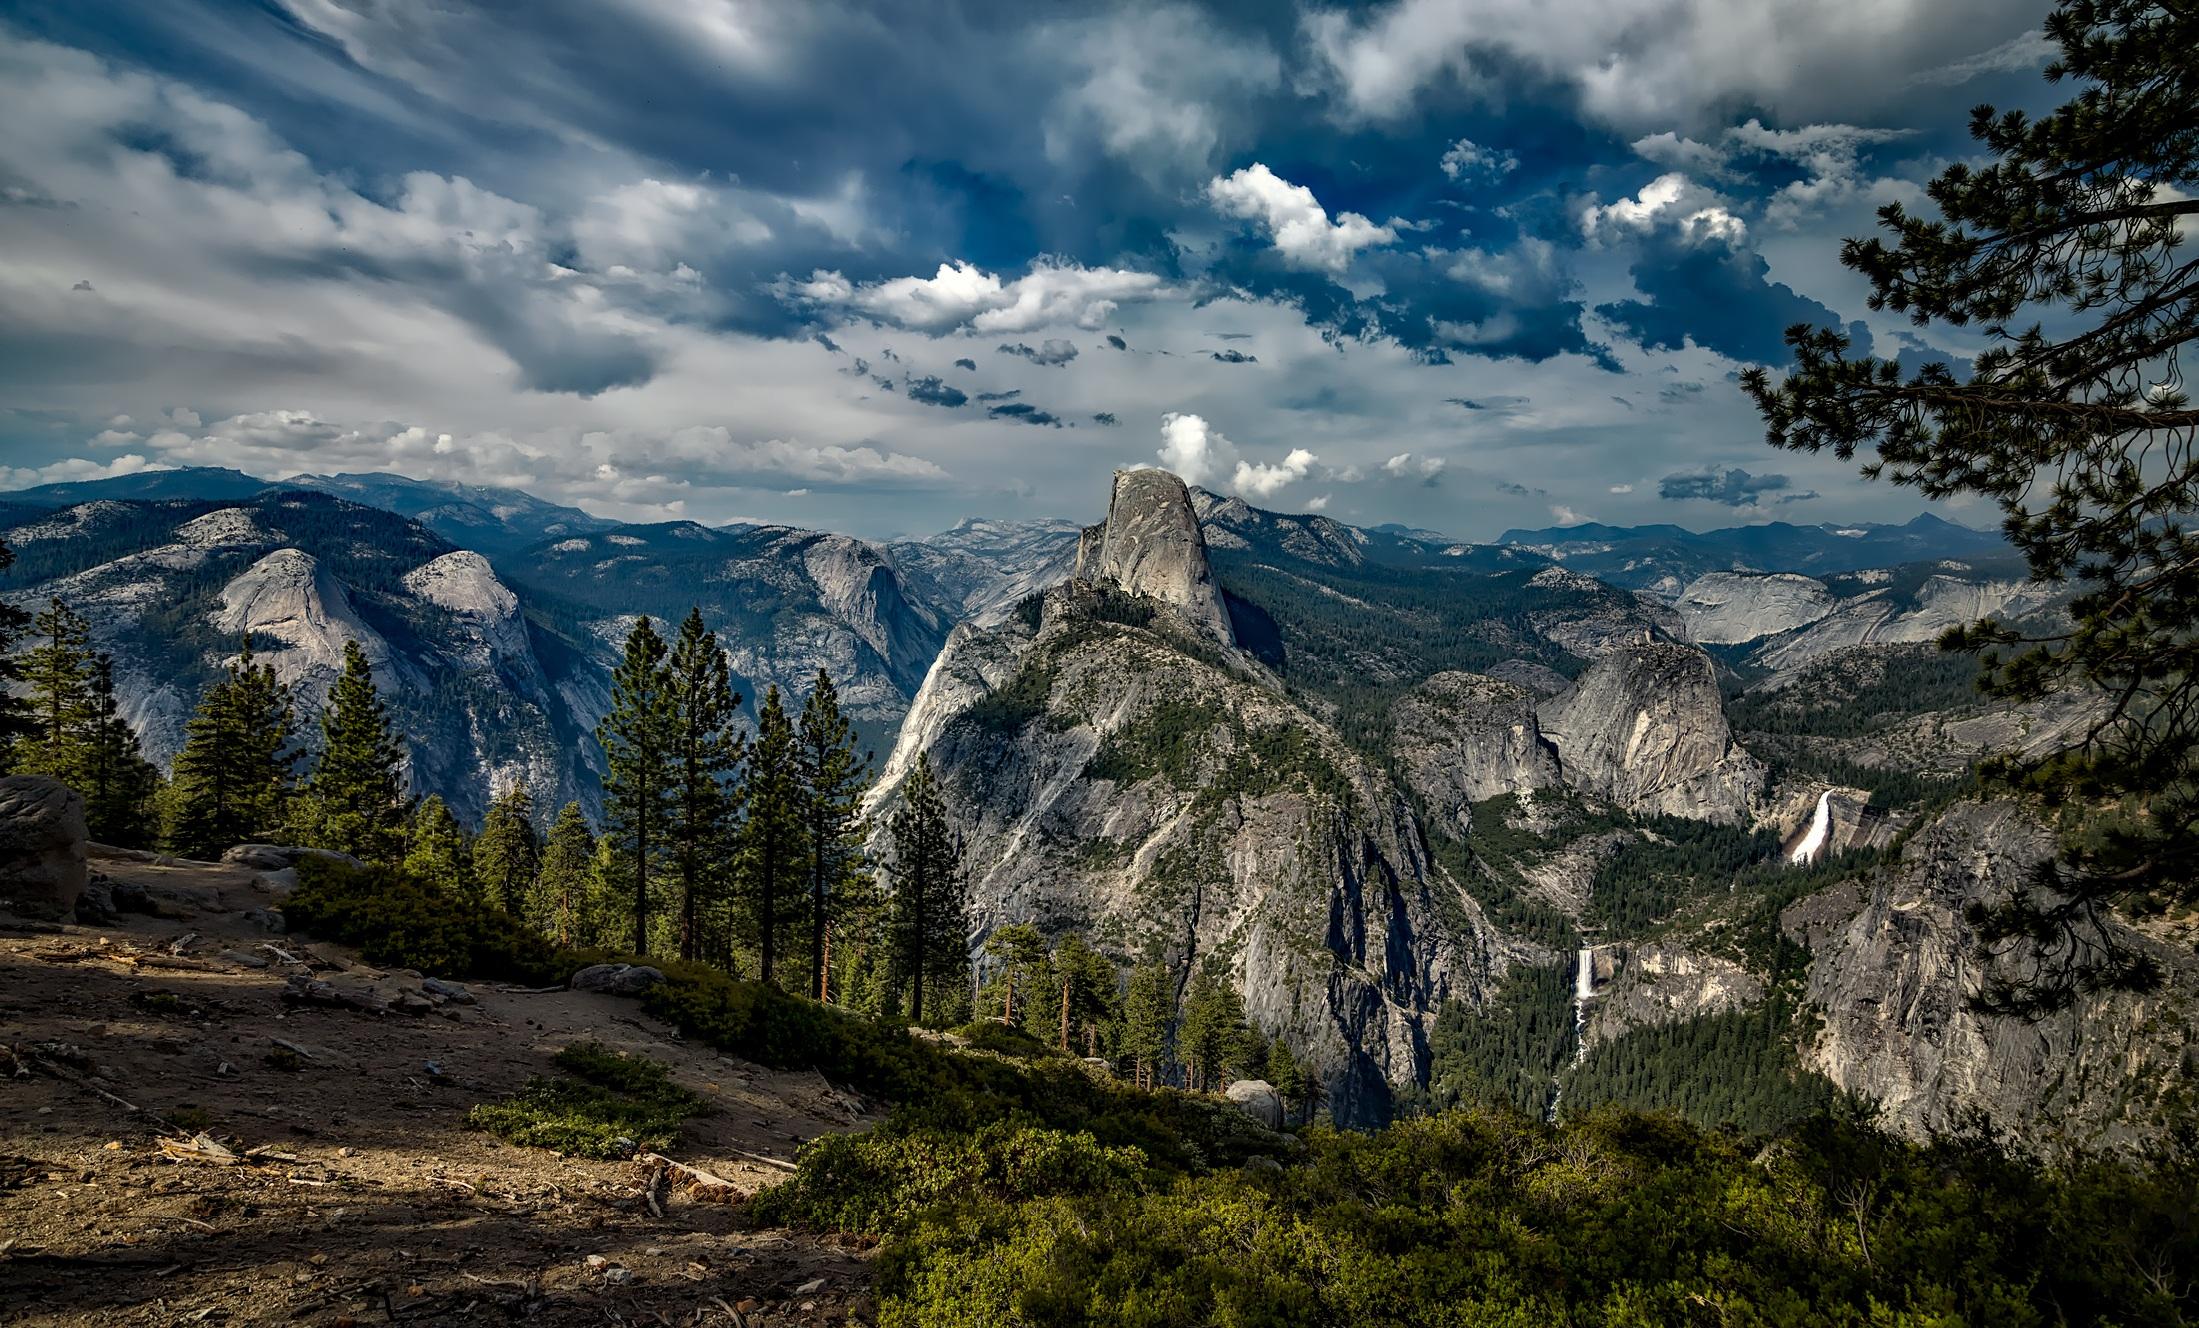 Yosemite, yosemite national park, half dome